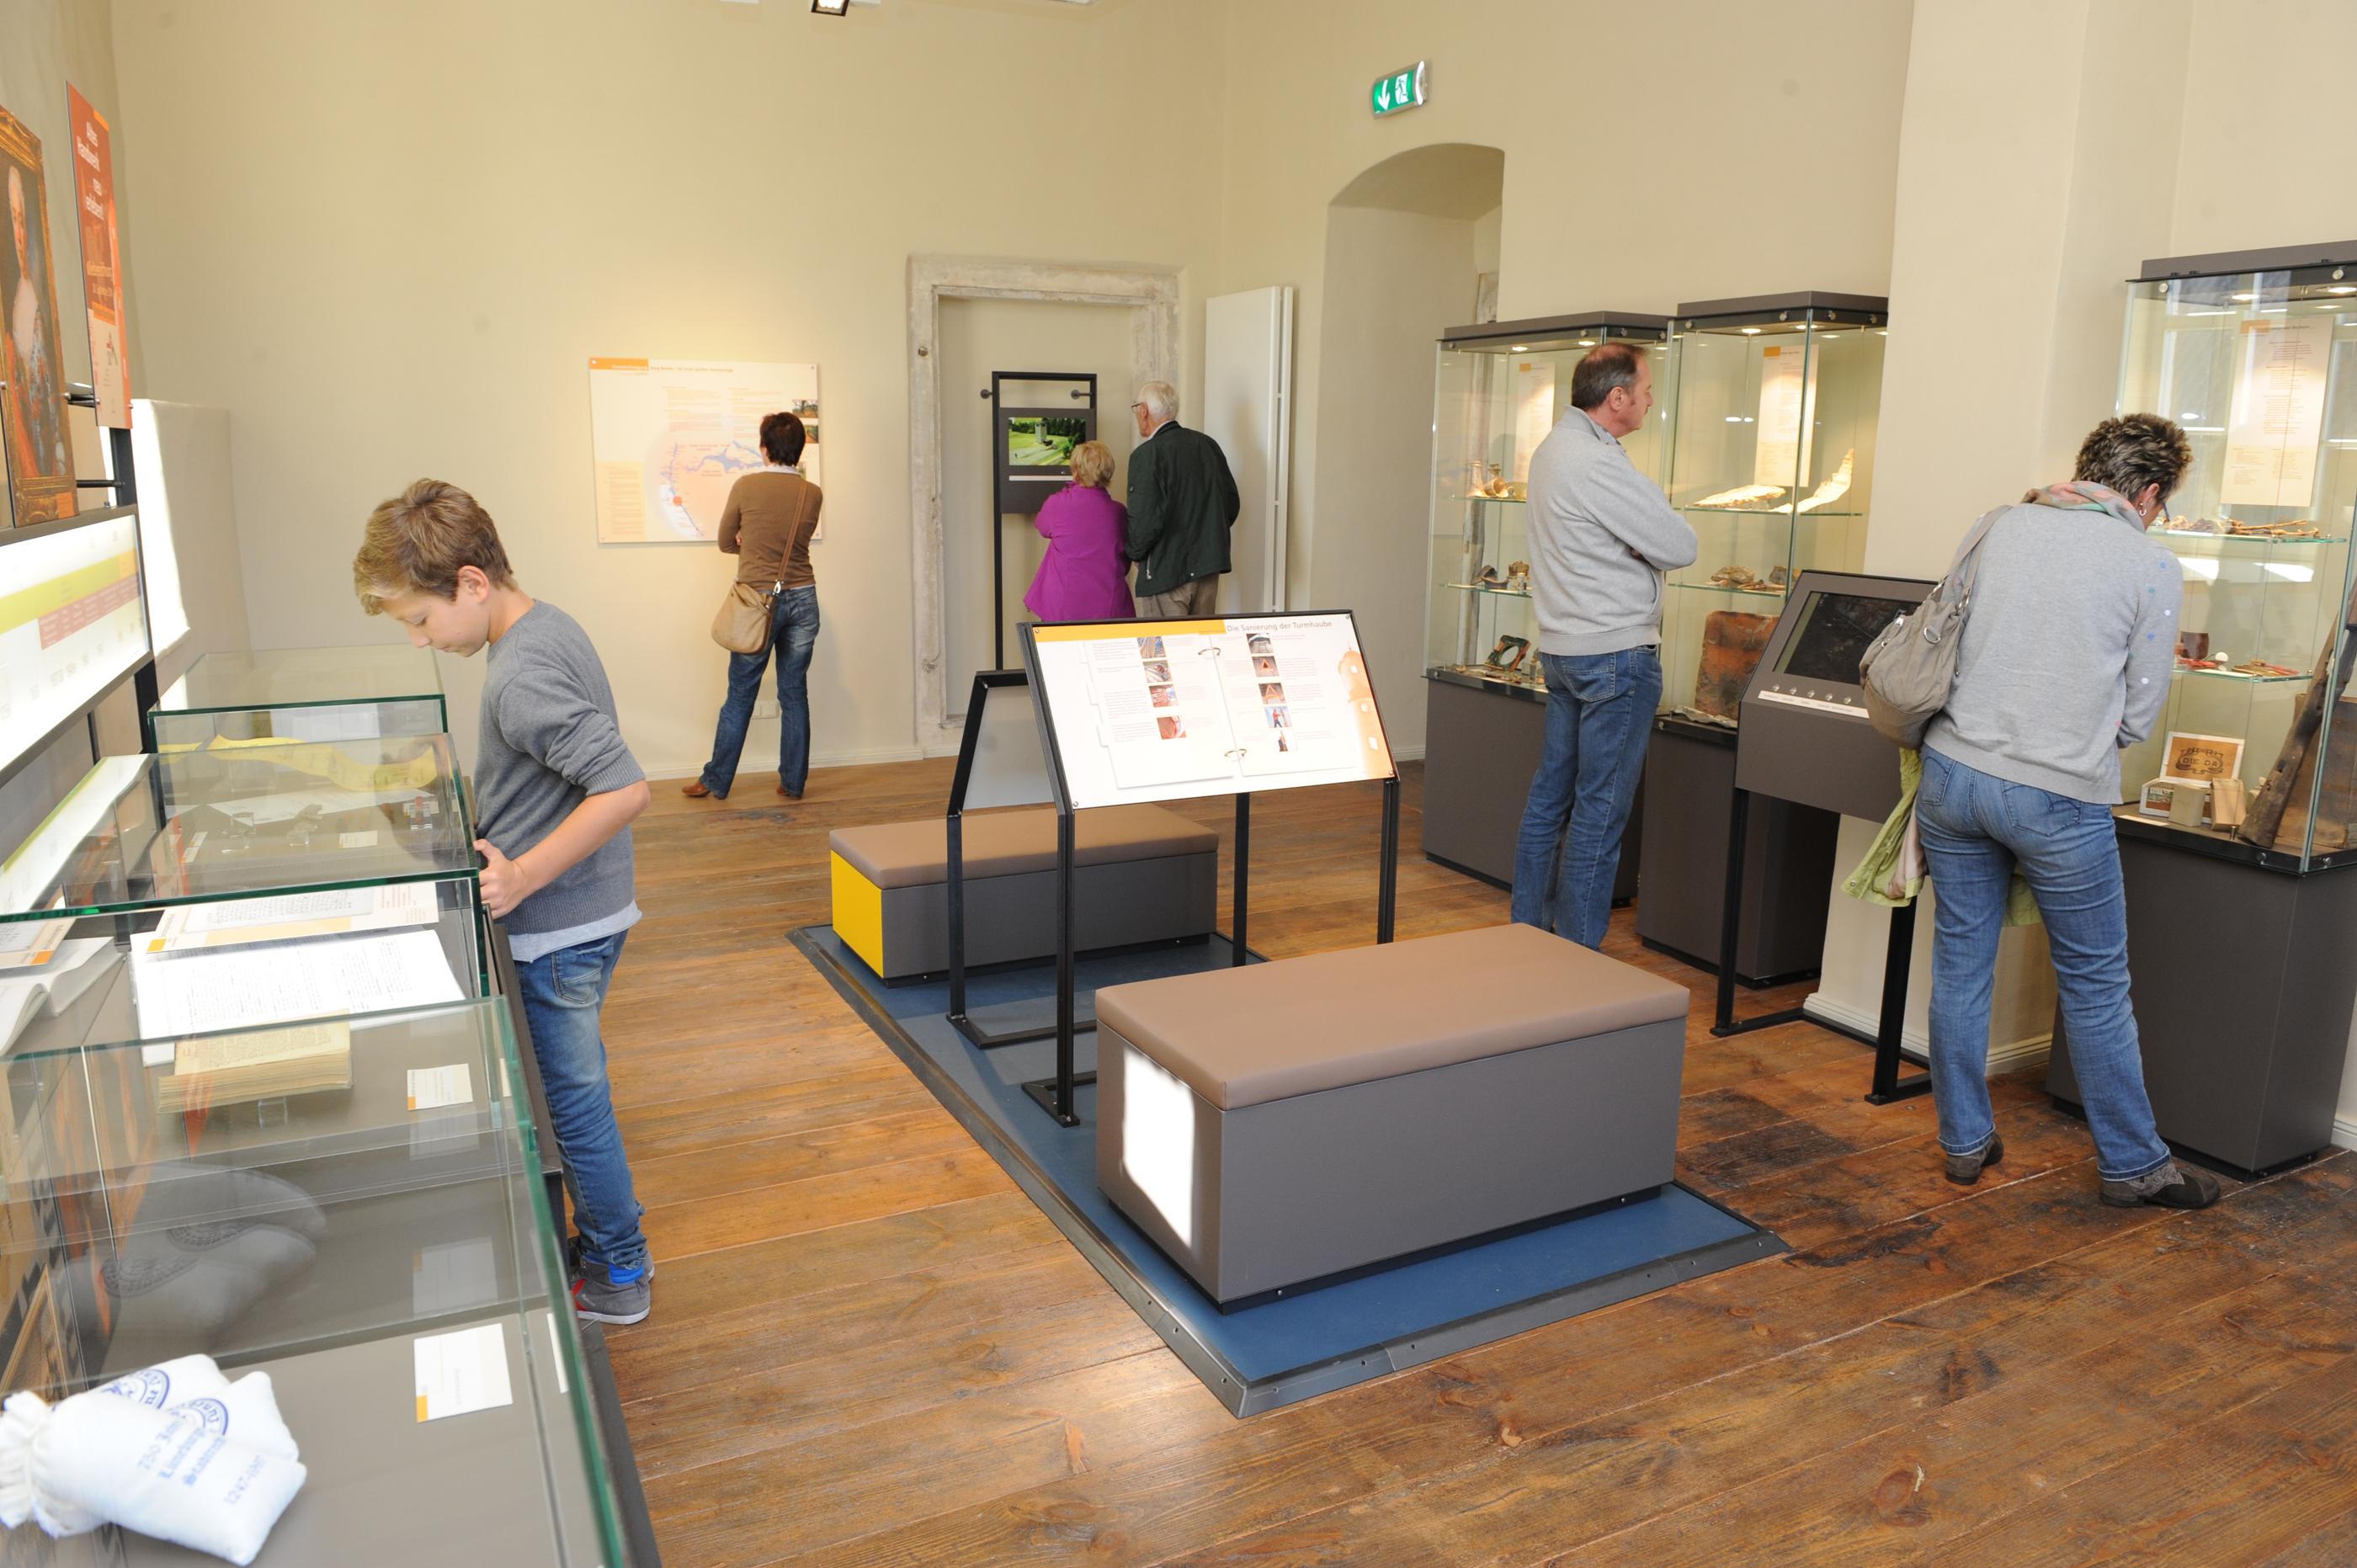 Ausstellungsräume in dem Museum Burg Brome